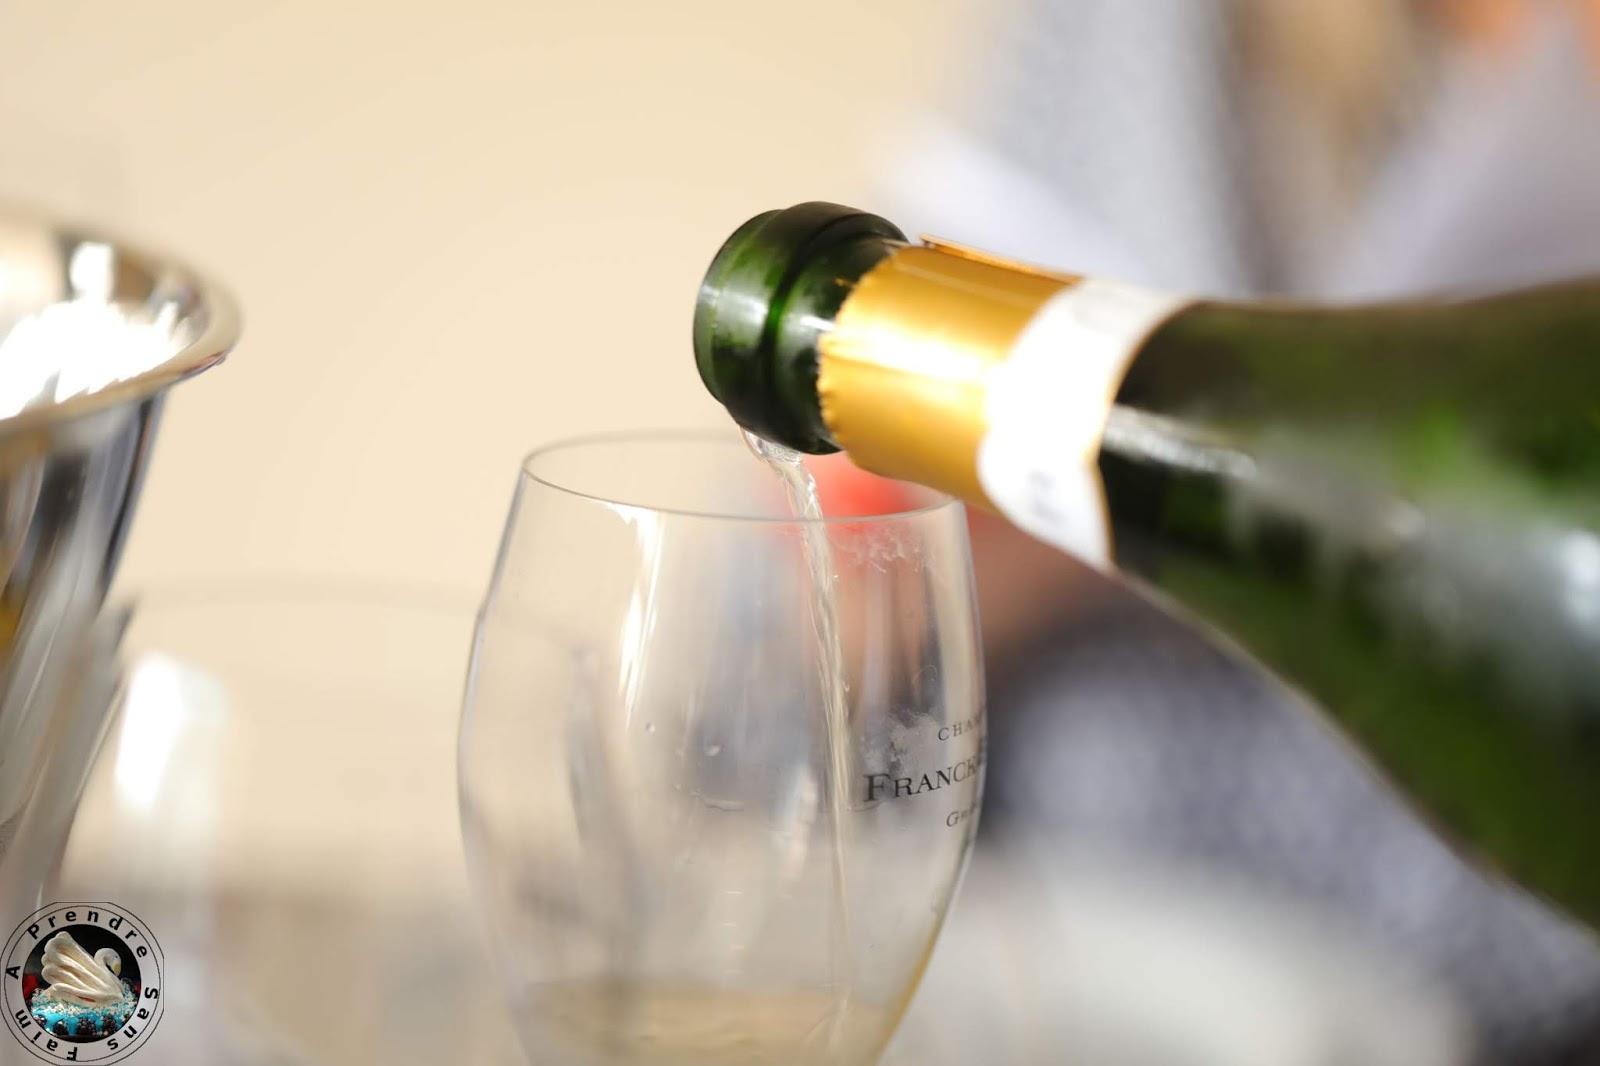 Visite et dégustations des Champagnes Franck Bonville